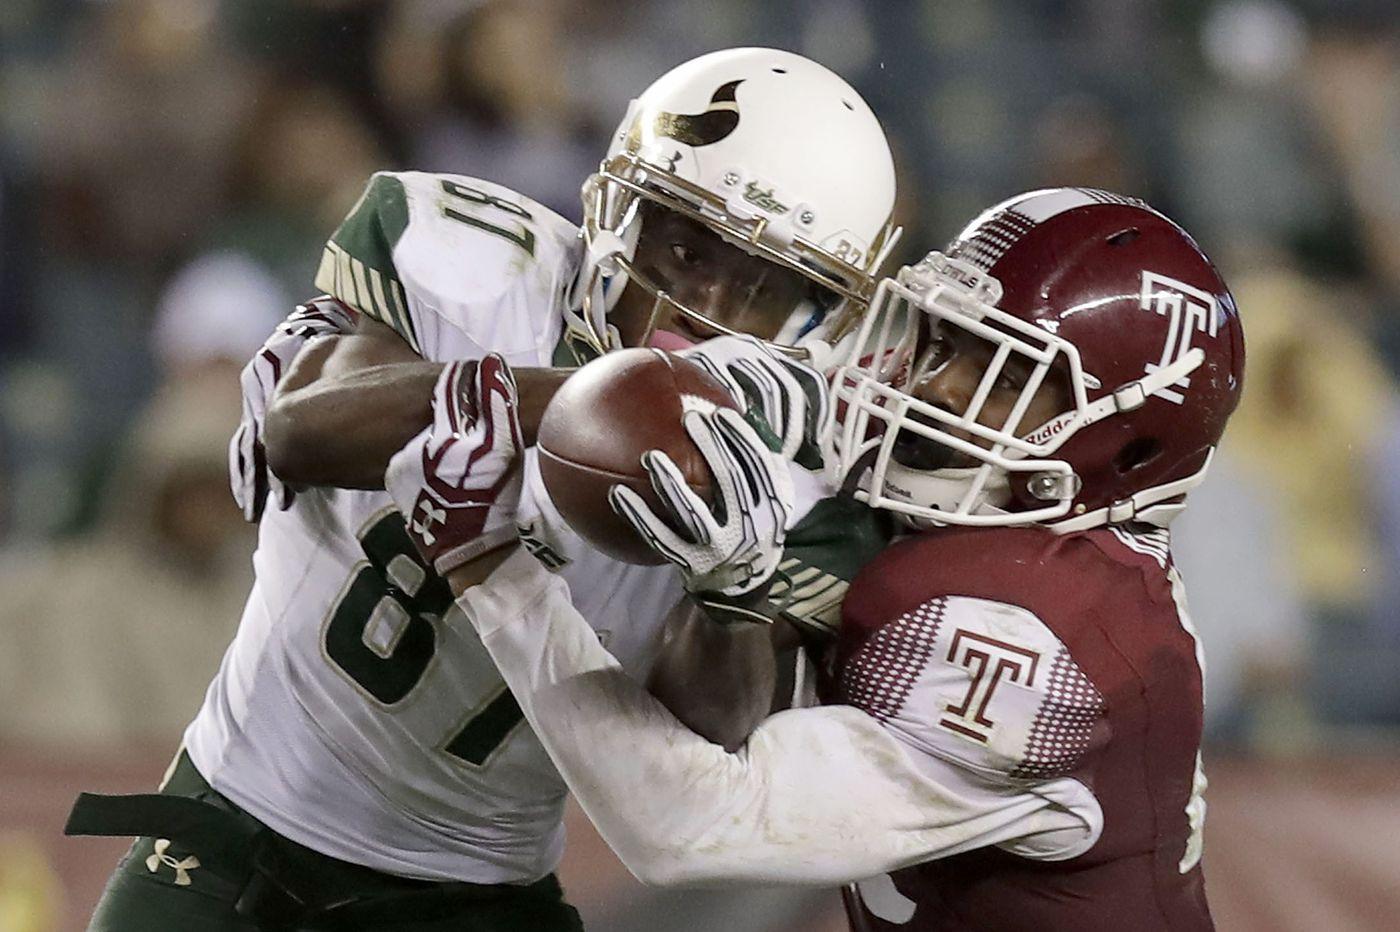 Temple's Delvon Randall ready for big, and healthy, senior season